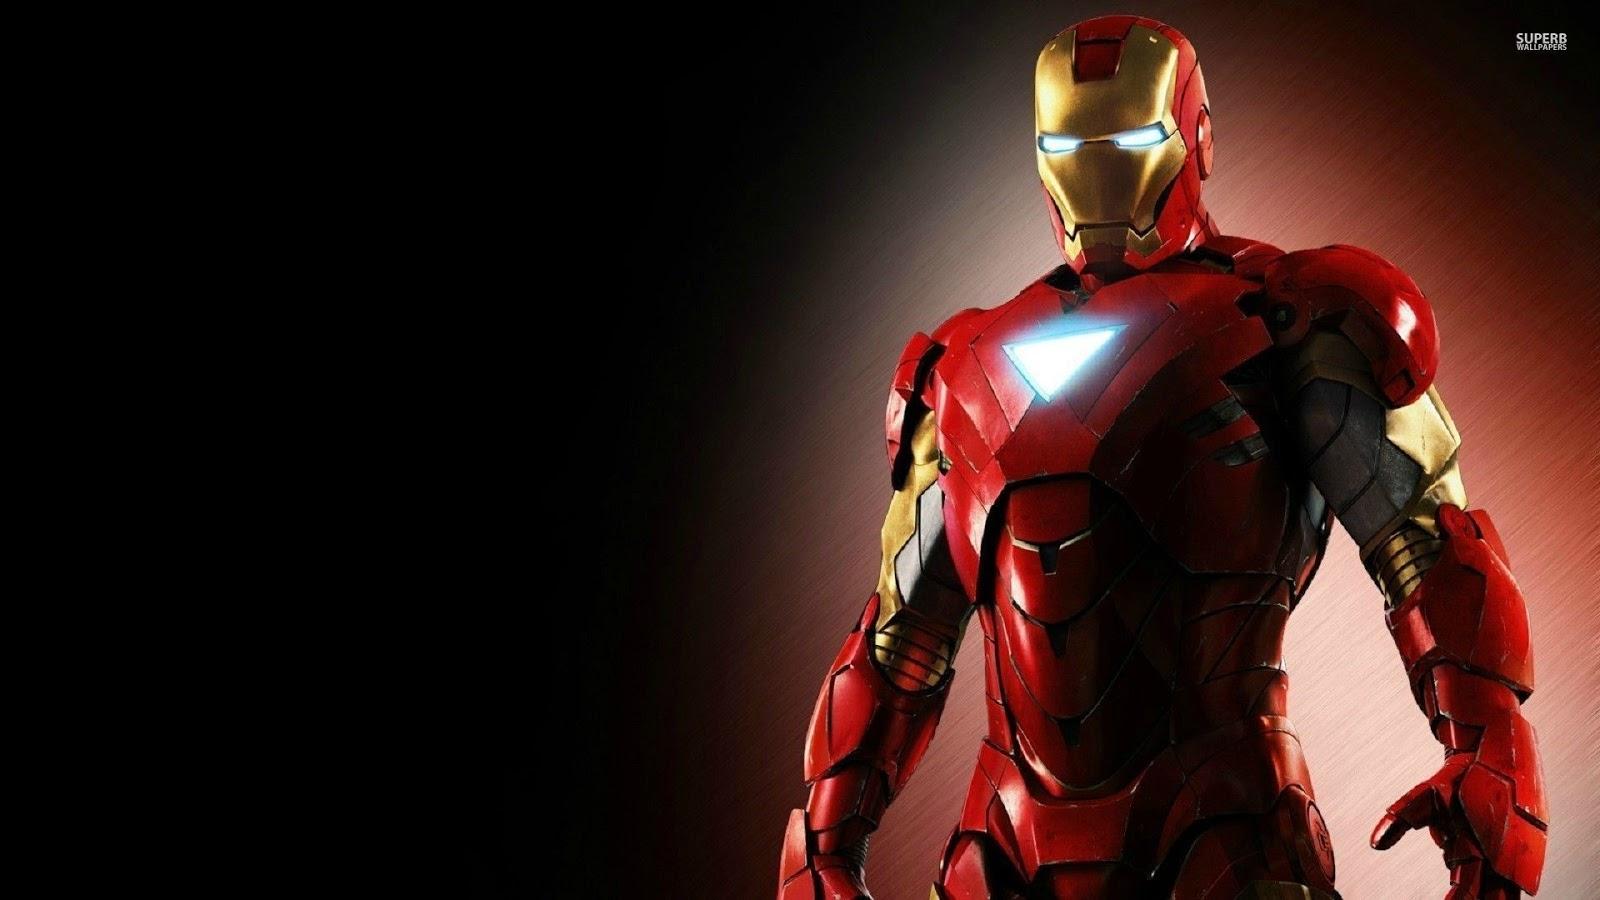 pics of iron man